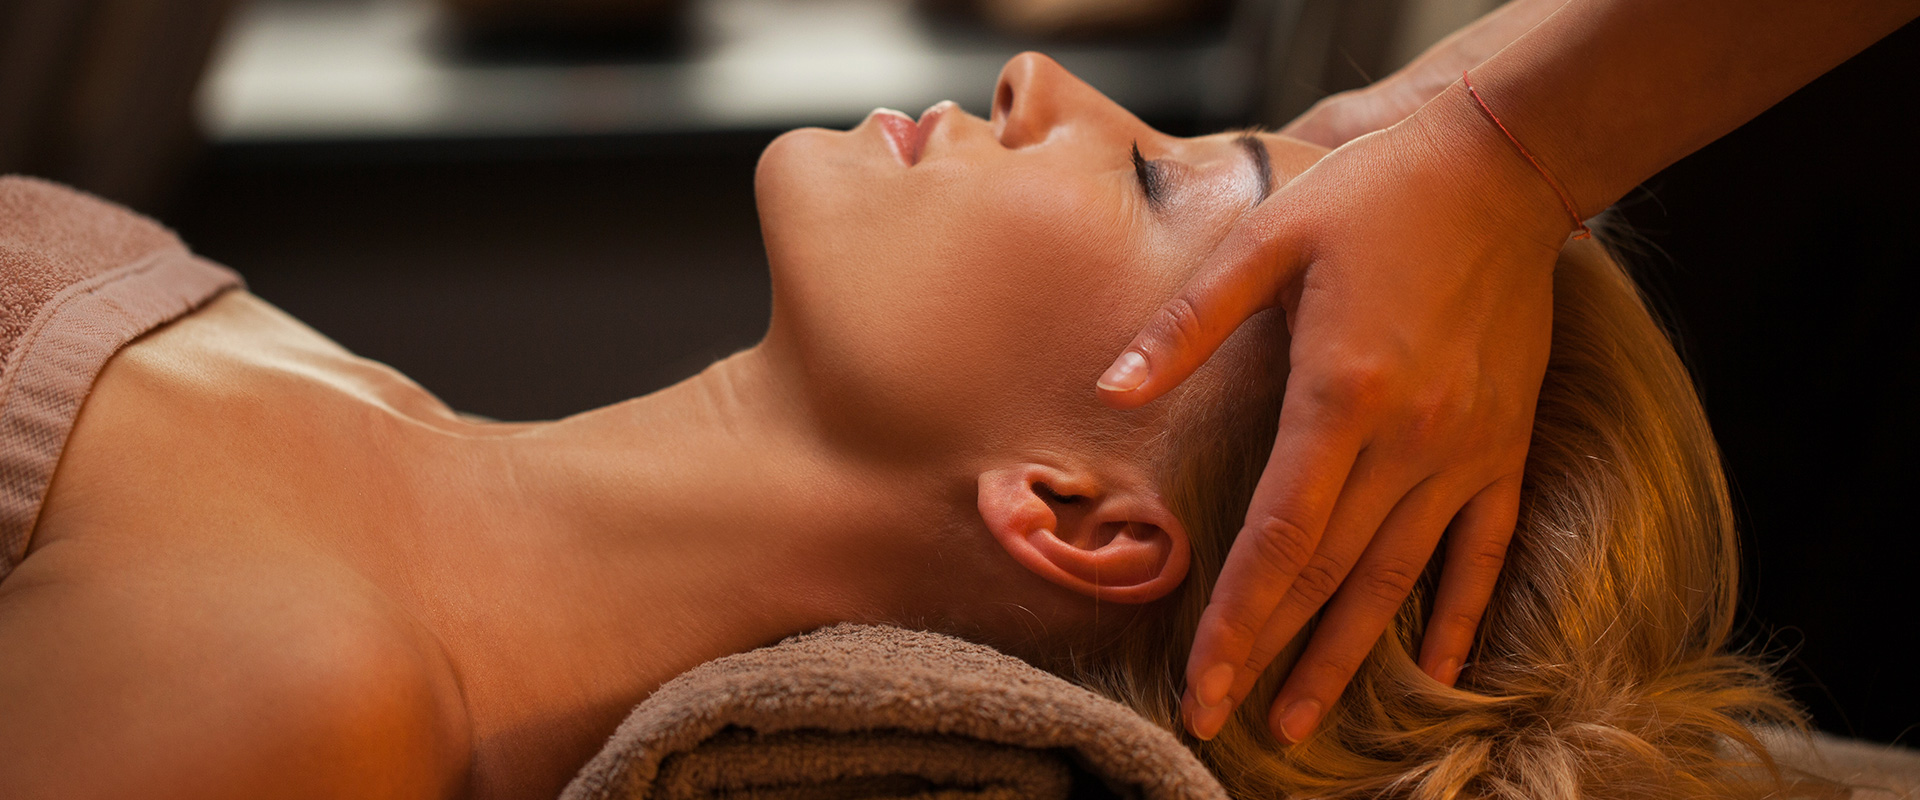 Massage Backbone Wellness Center I Cedar Park, Texas-2710